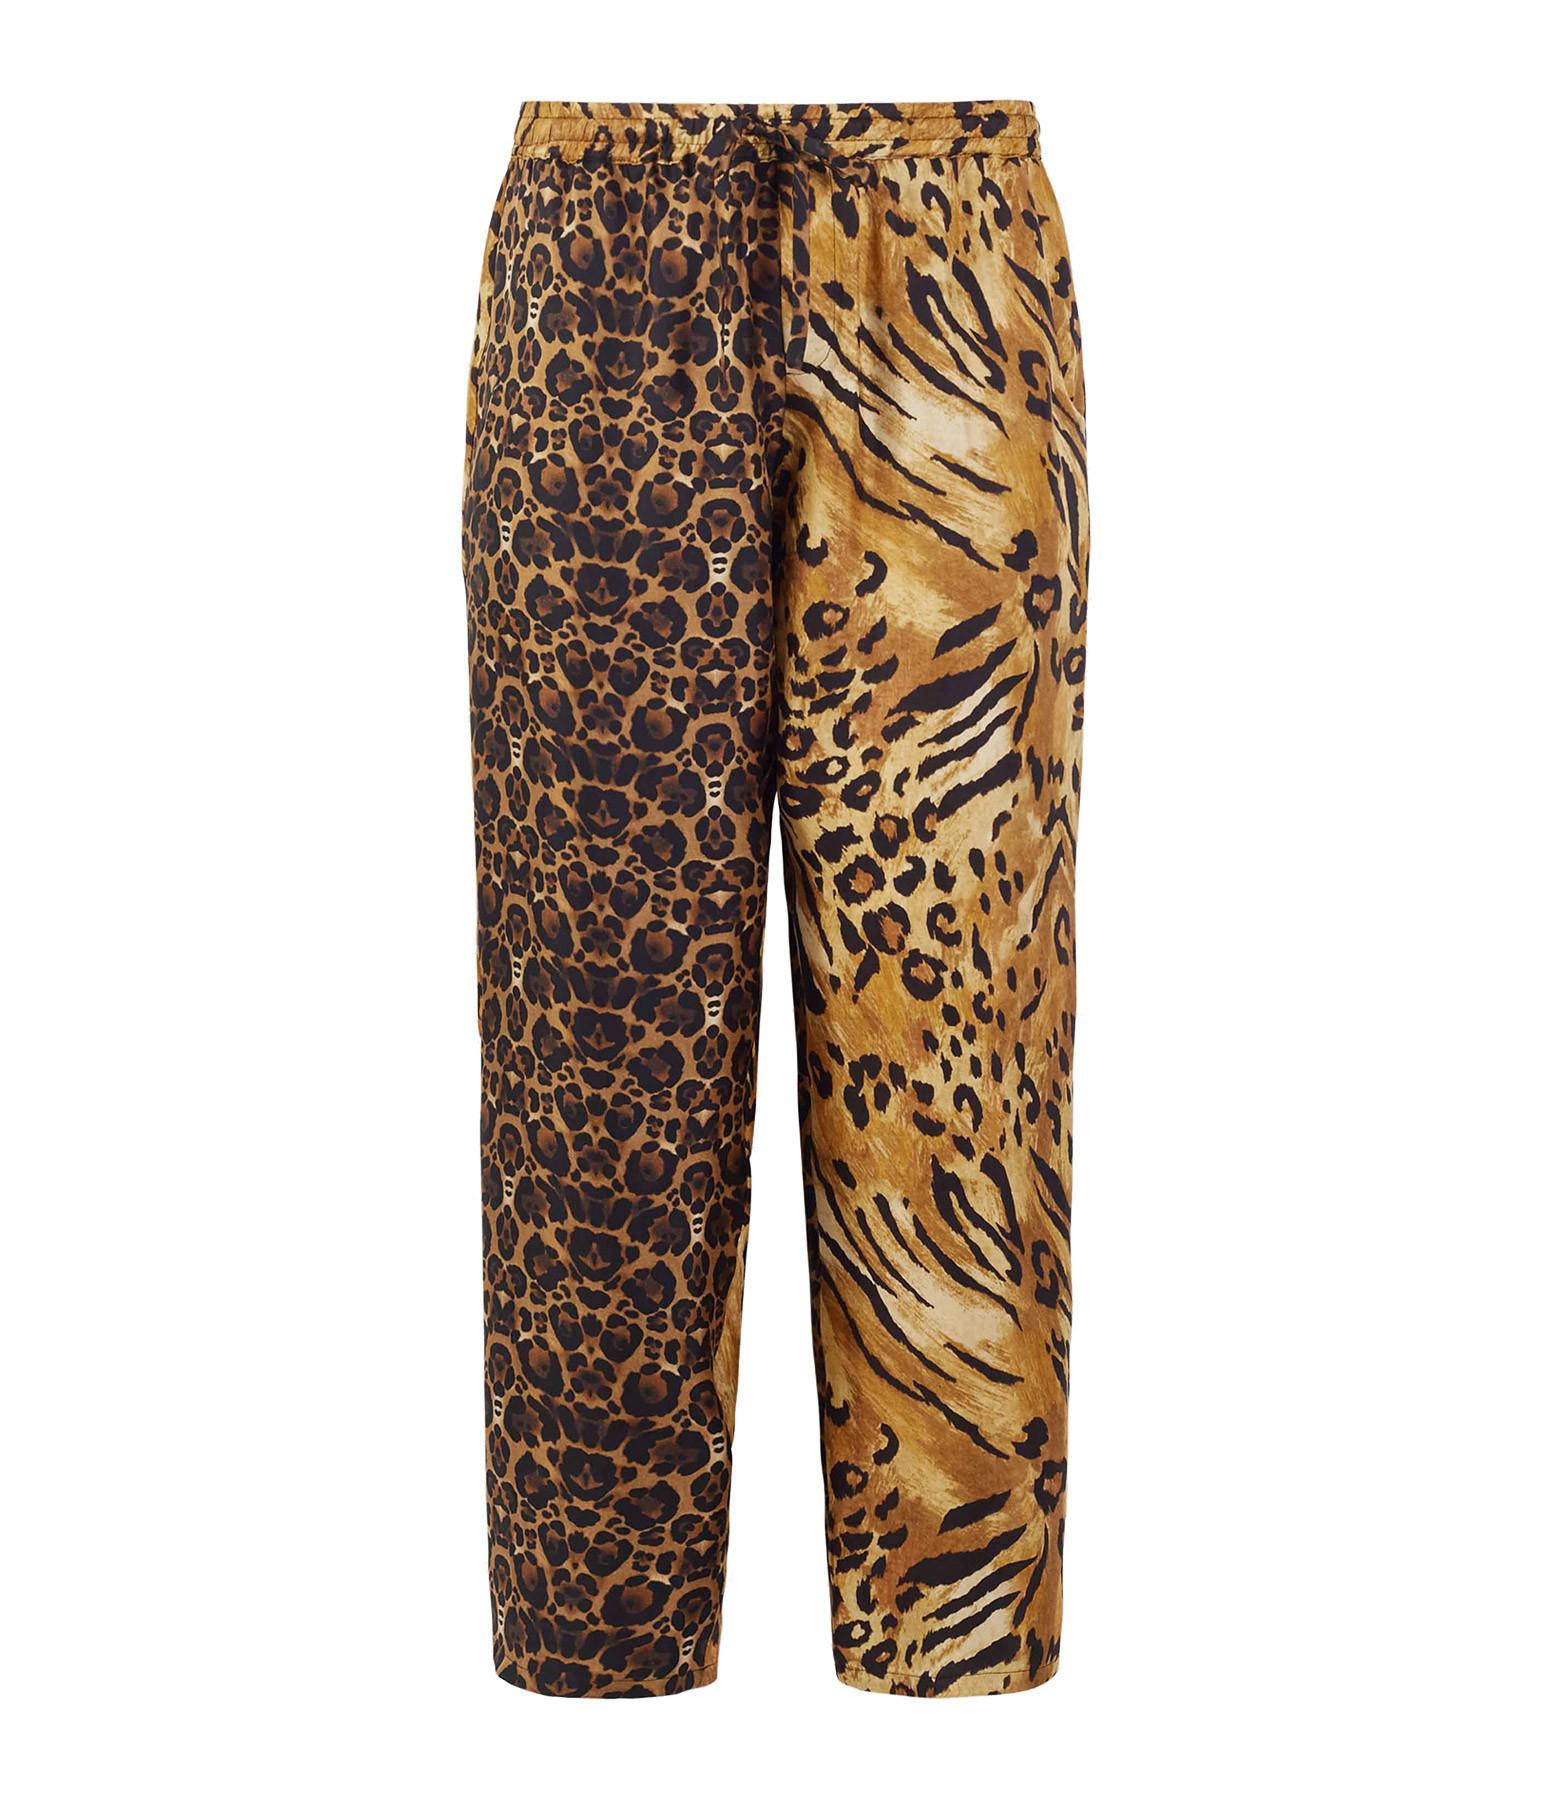 PIERRE-LOUIS MASCIA - Pantalon Aloe Soie Imprimé Animal